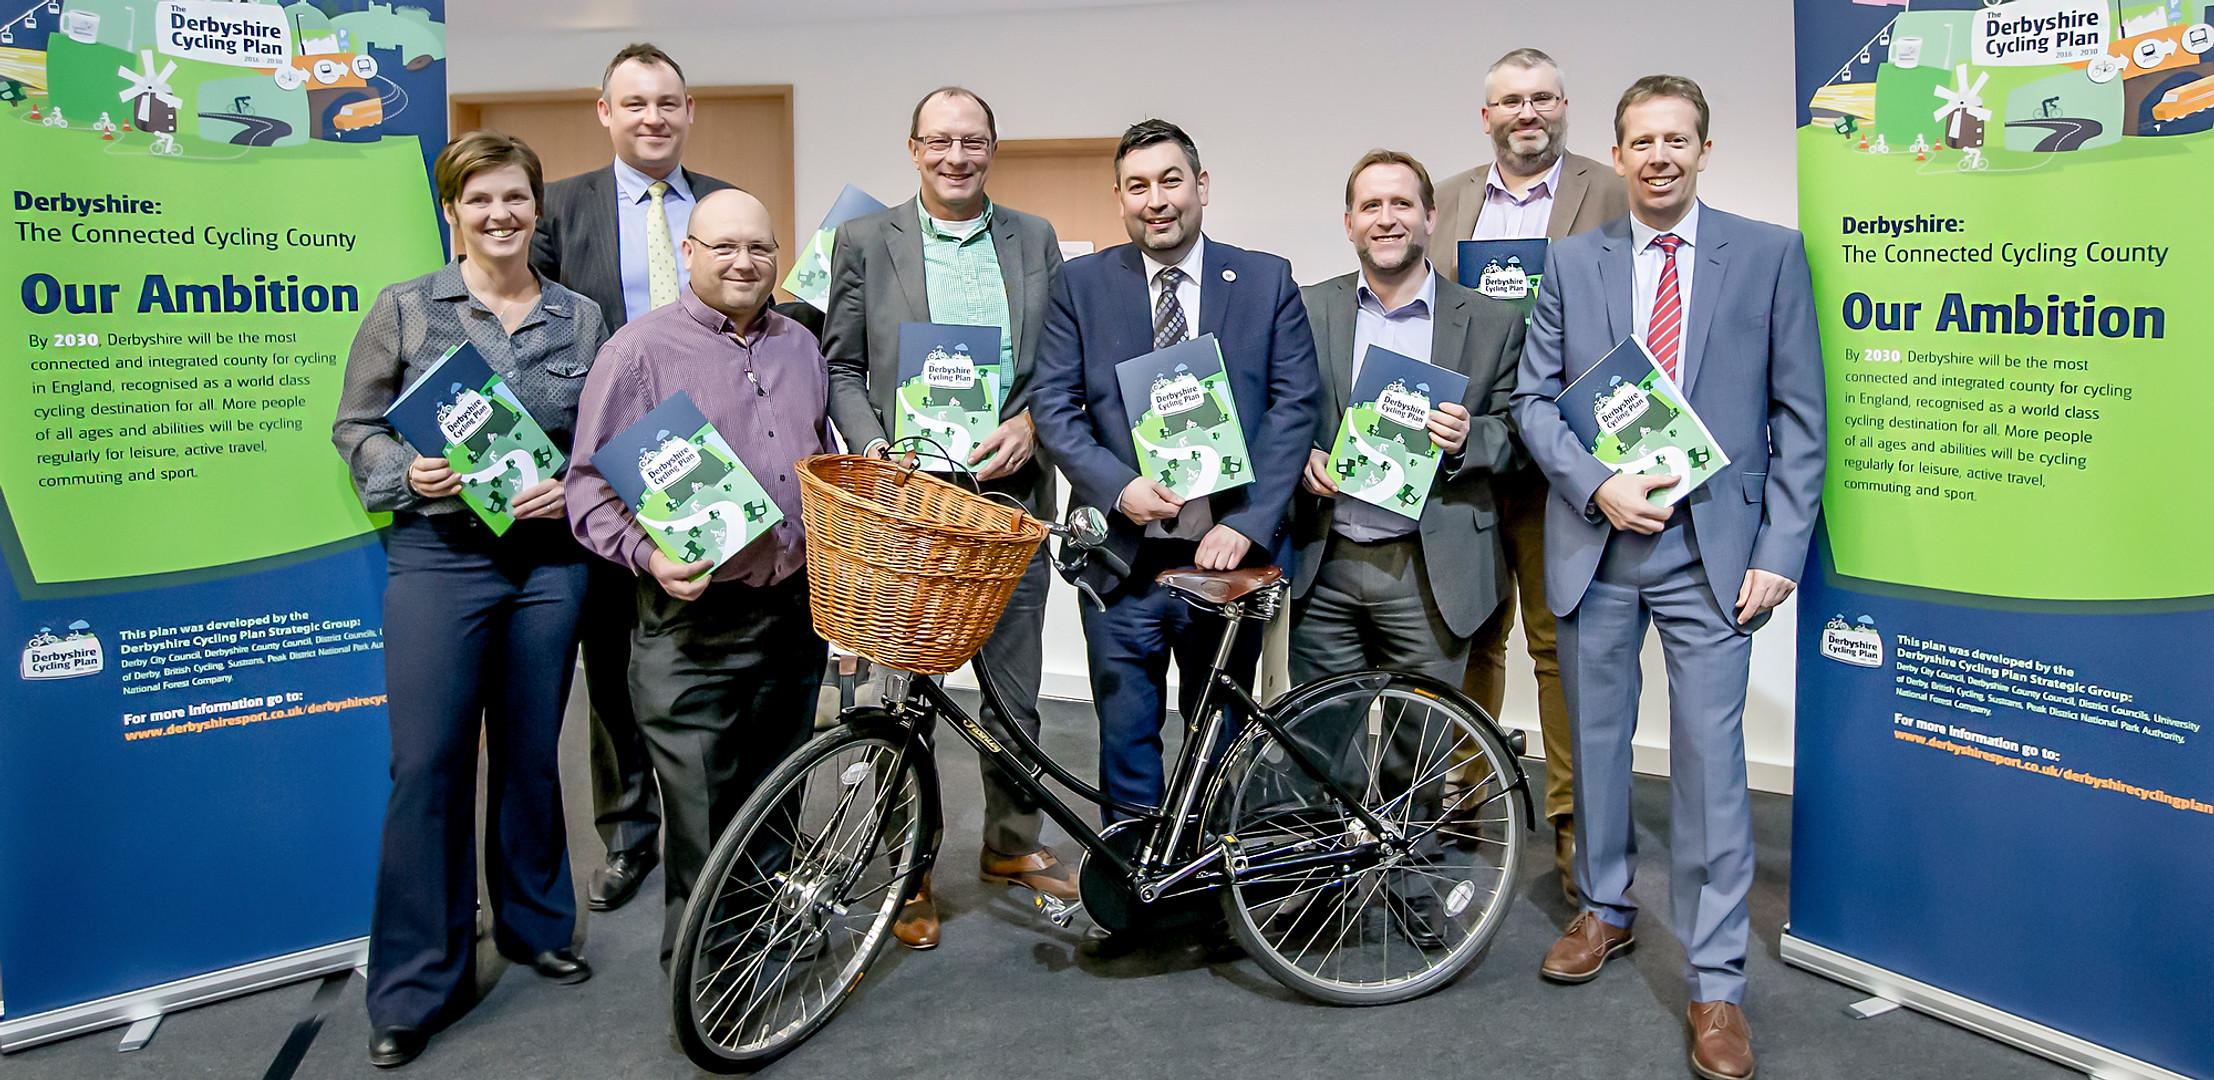 Derbyshire_Cycling_Plan_Launch_19_01_201